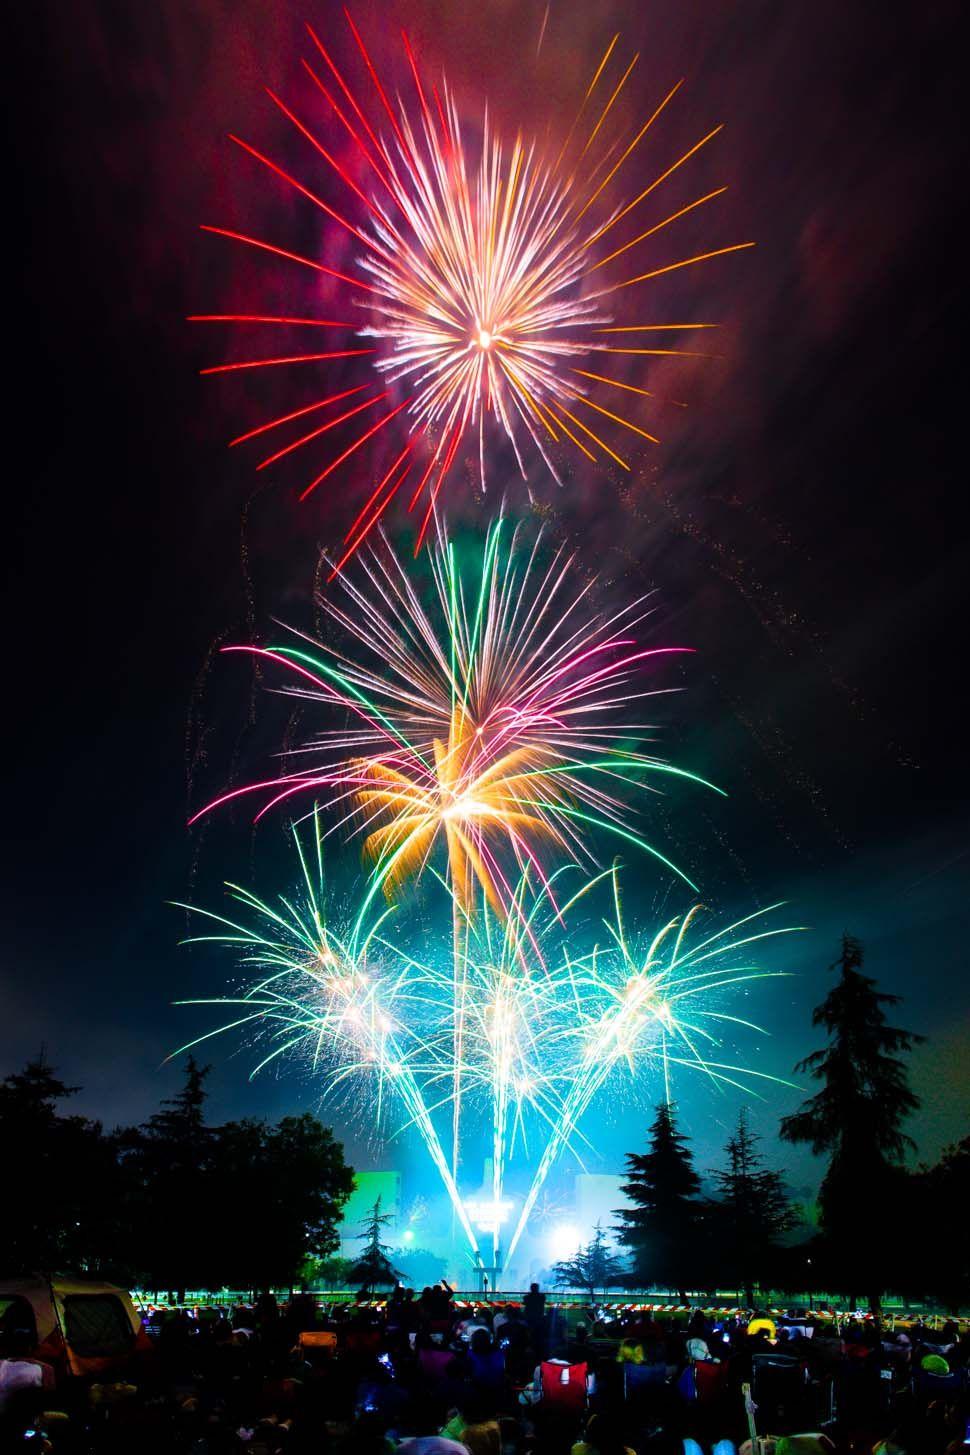 Original Jpg 970 1 455 Pixels Silvester Feuerwerk Feuerwerk Bilder